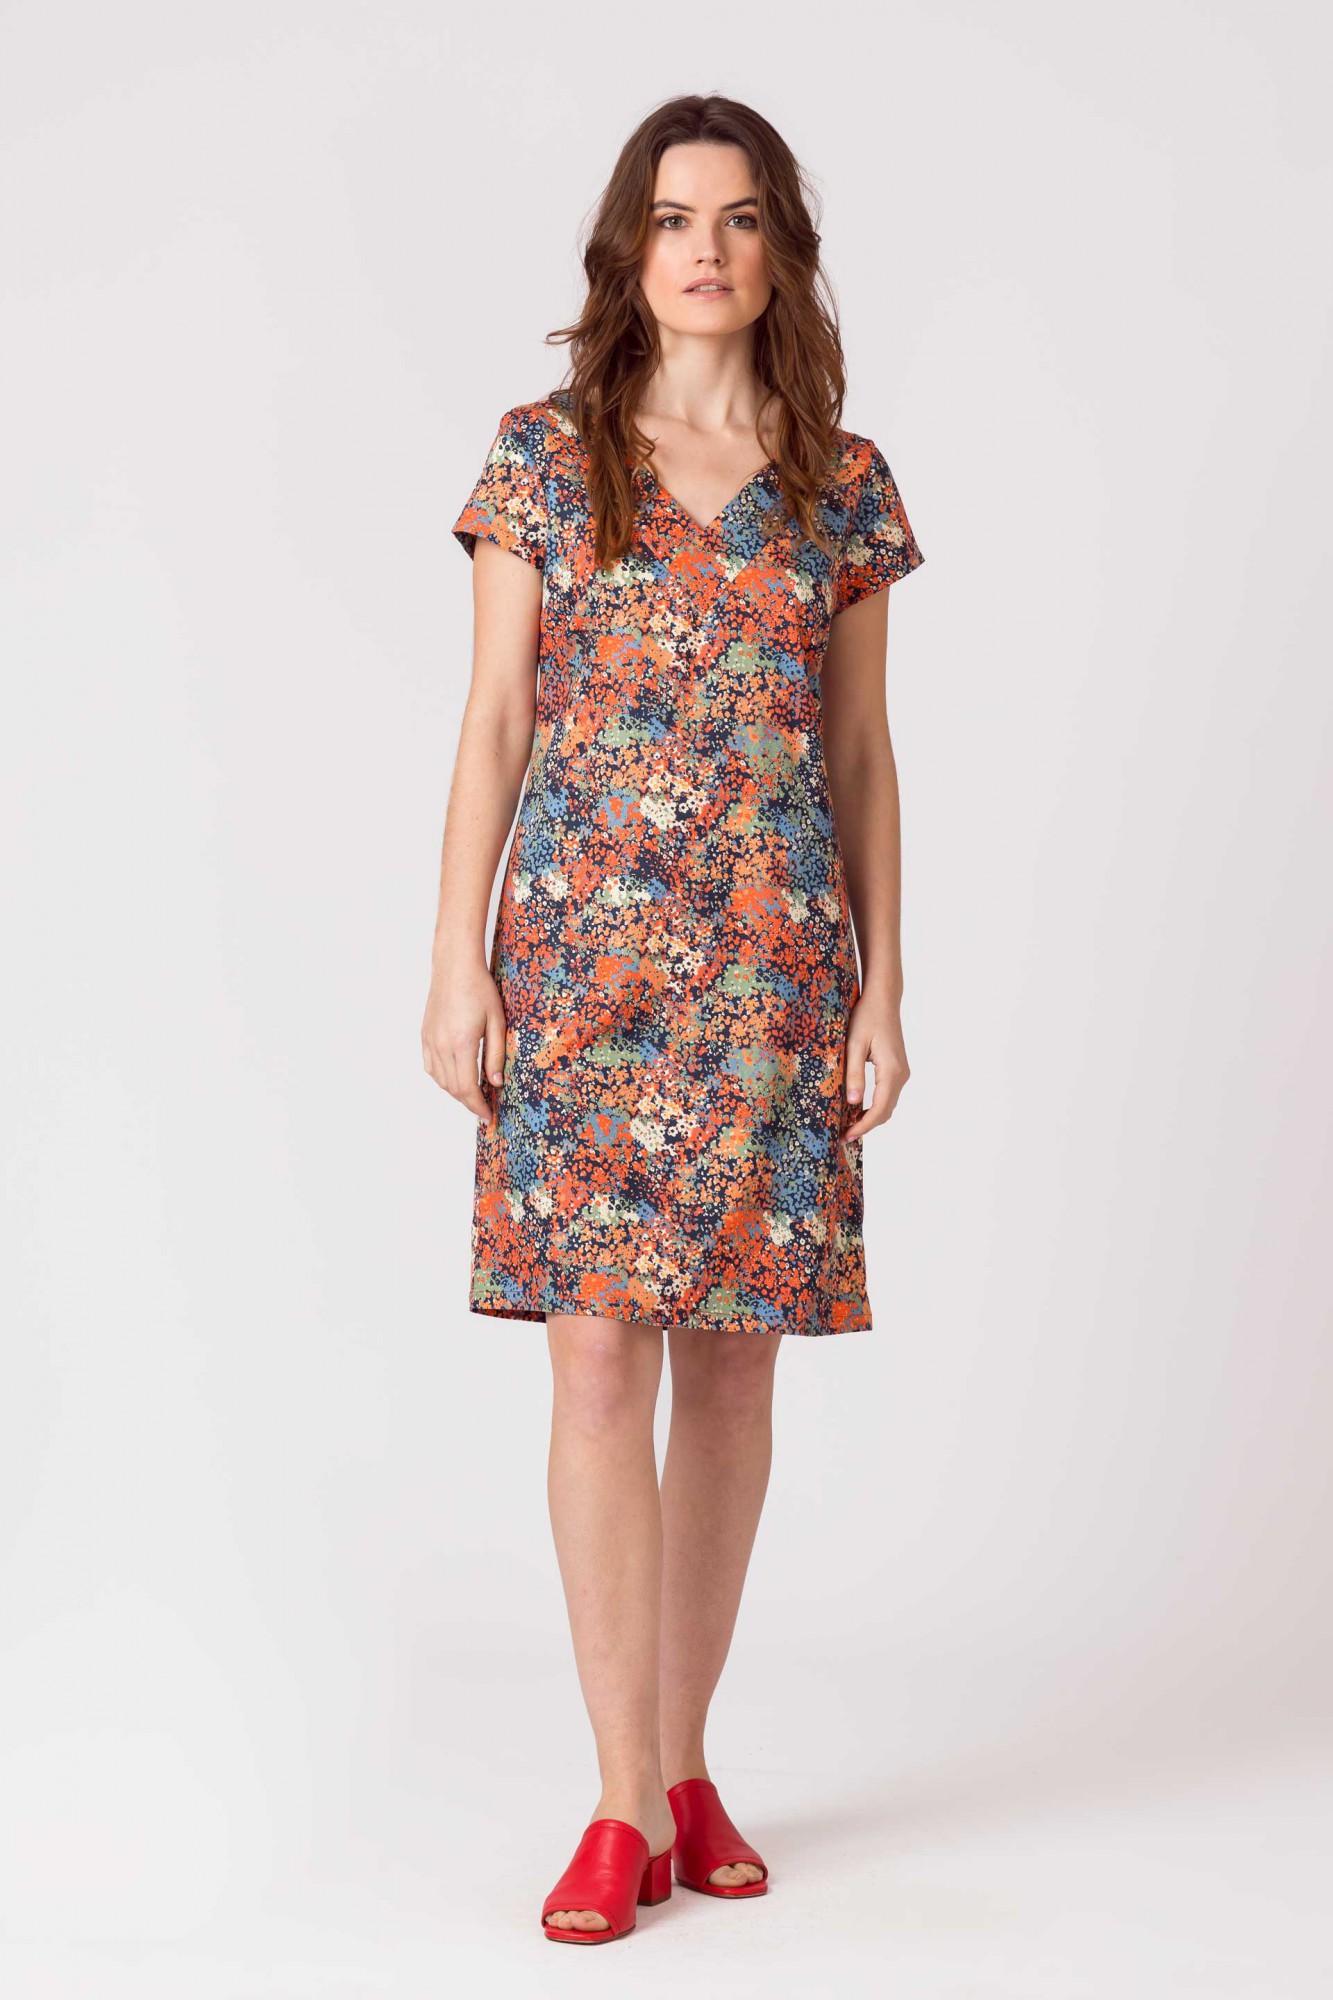 Floral dress SKFK, domna